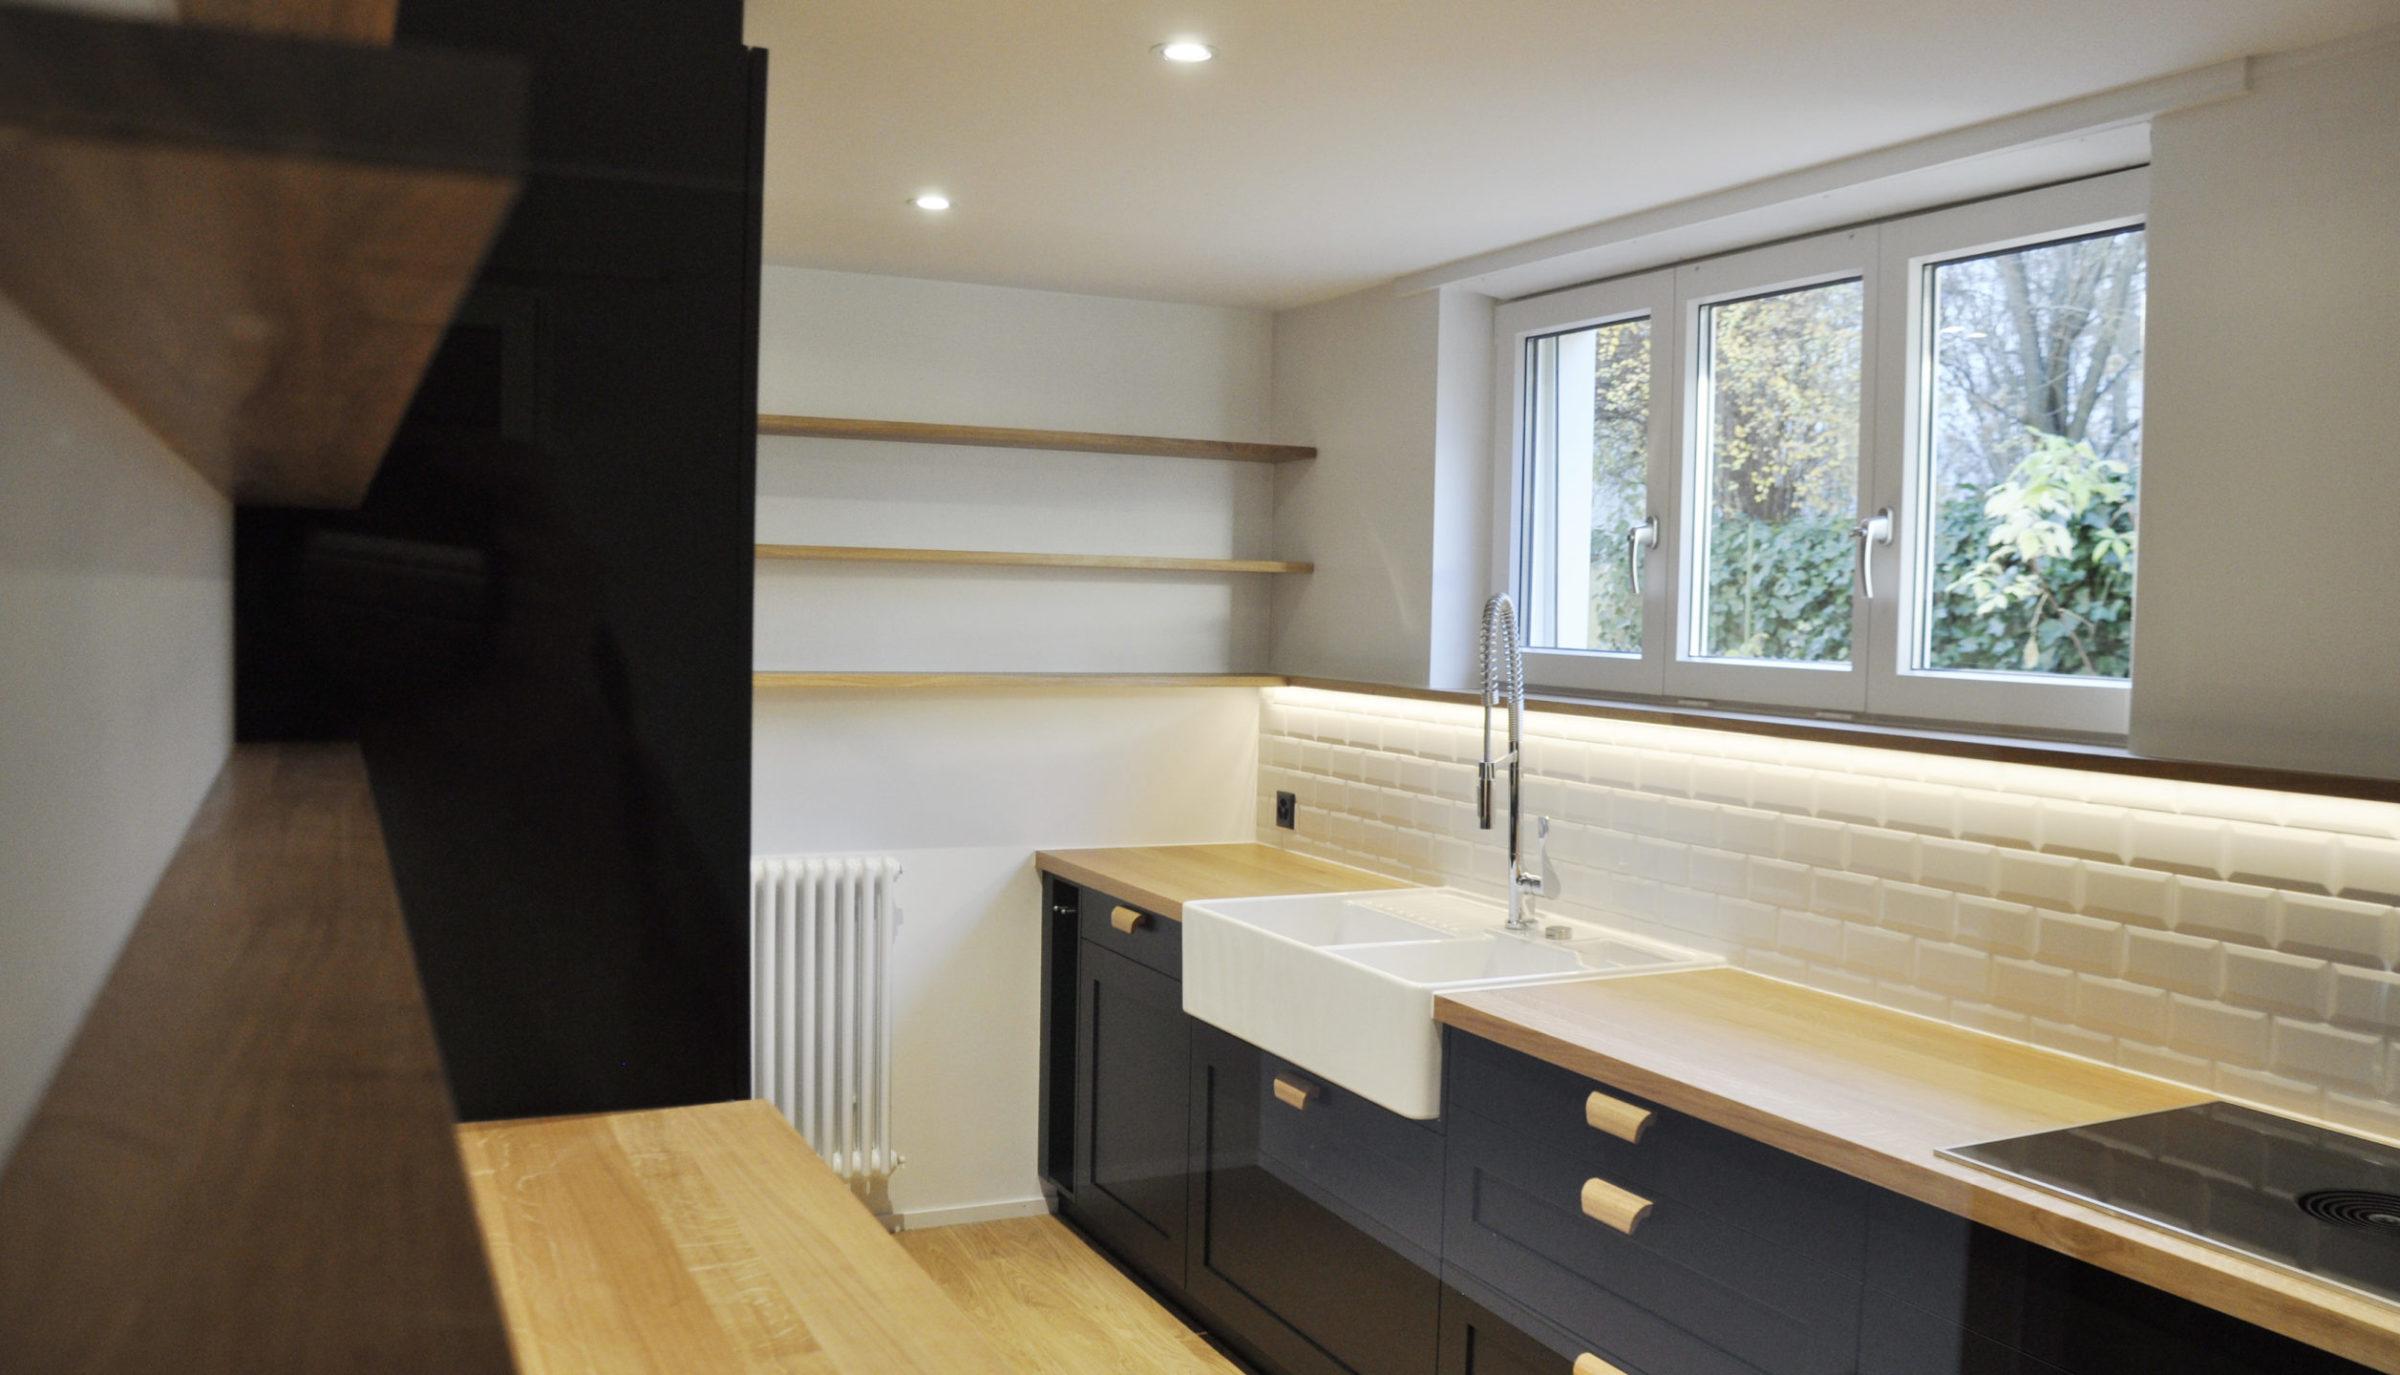 Umbau EFH Oberwil - neue Küche